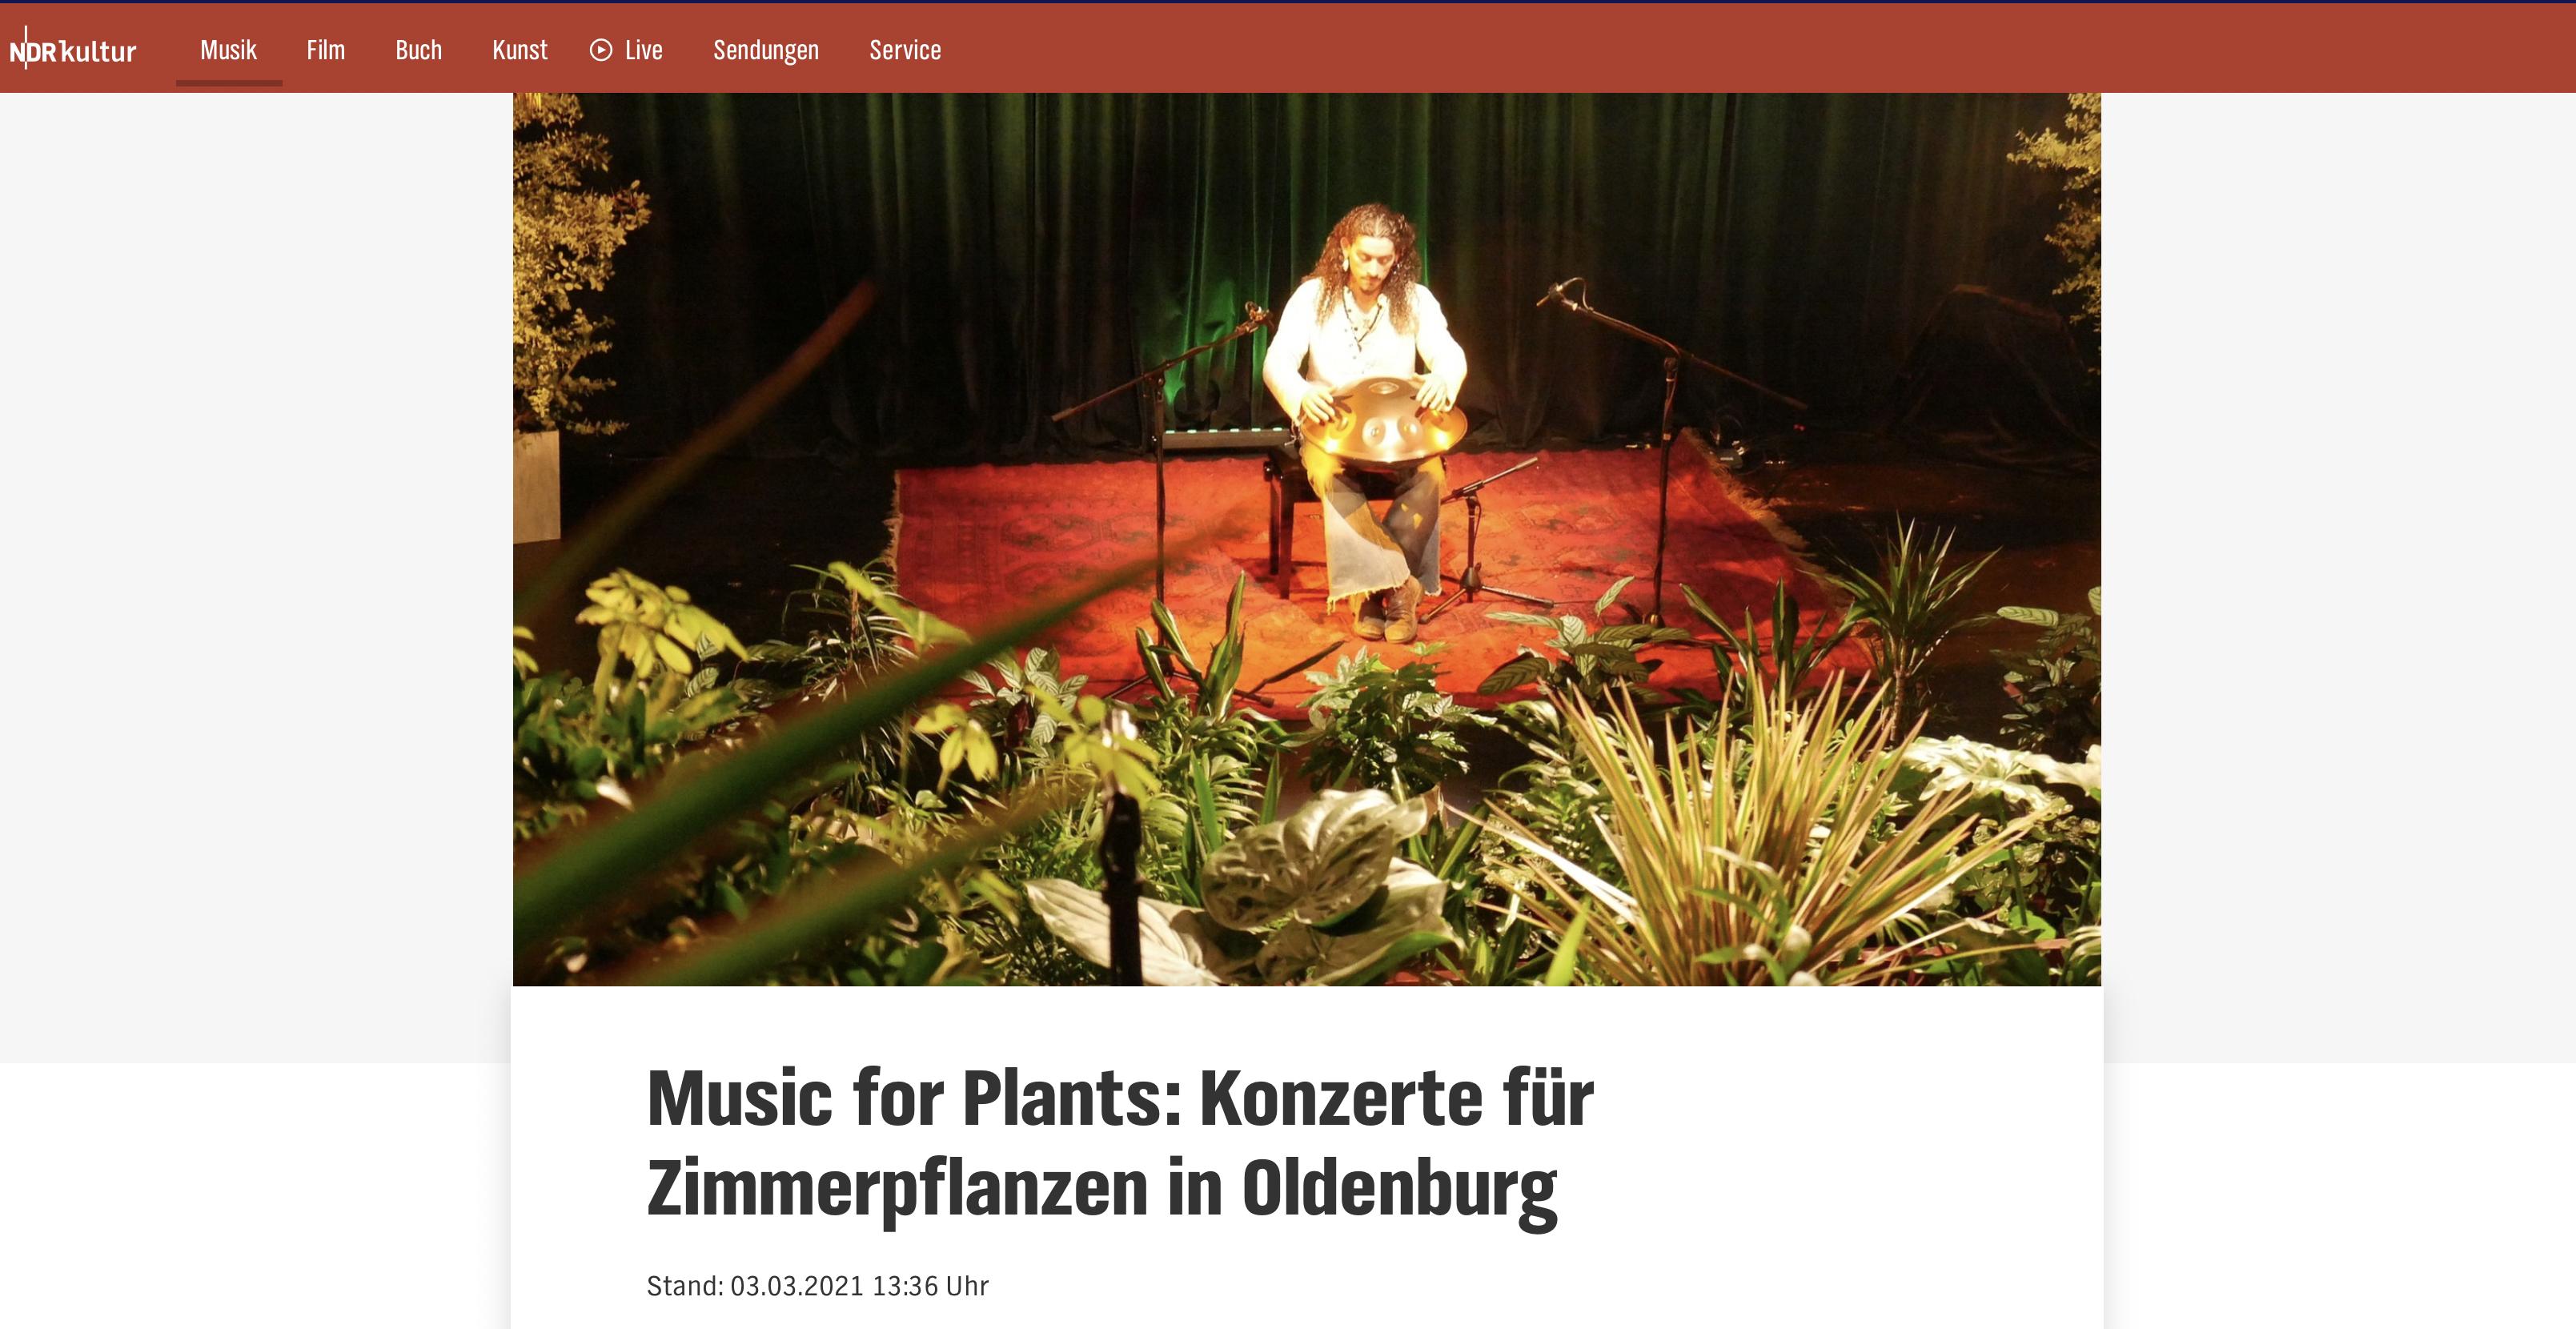 NDR-Kultur Music for Plants